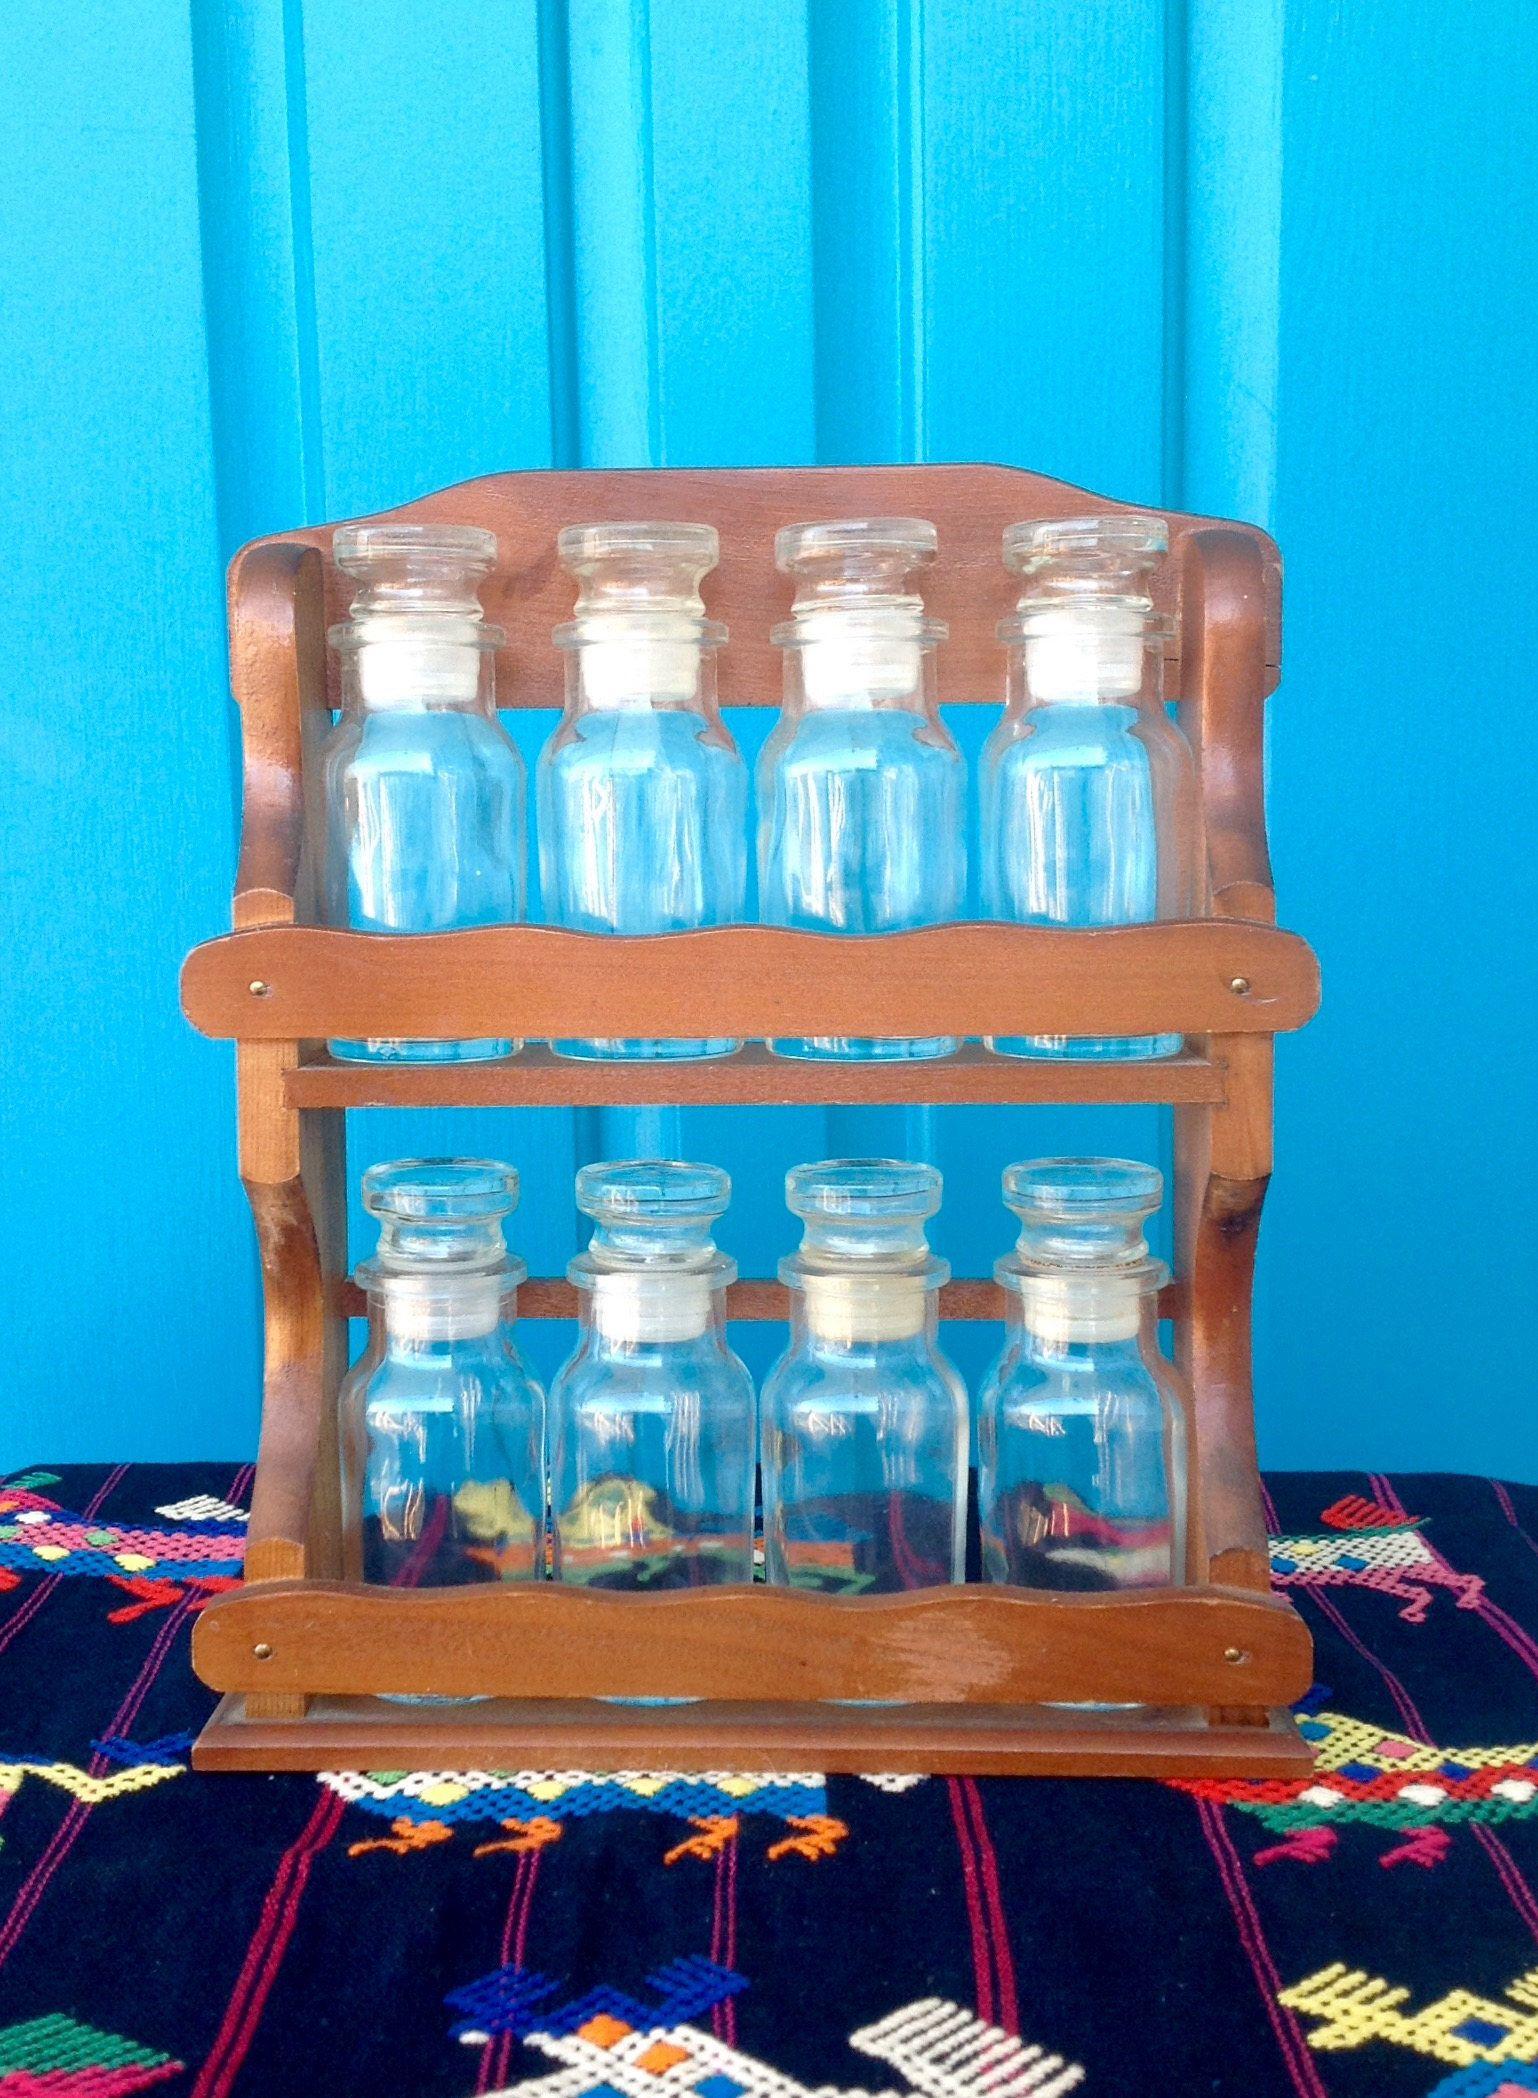 Vintage Farmhouse Wood Spice Rack with Glass Spice Jars-8 Spice Jars ...